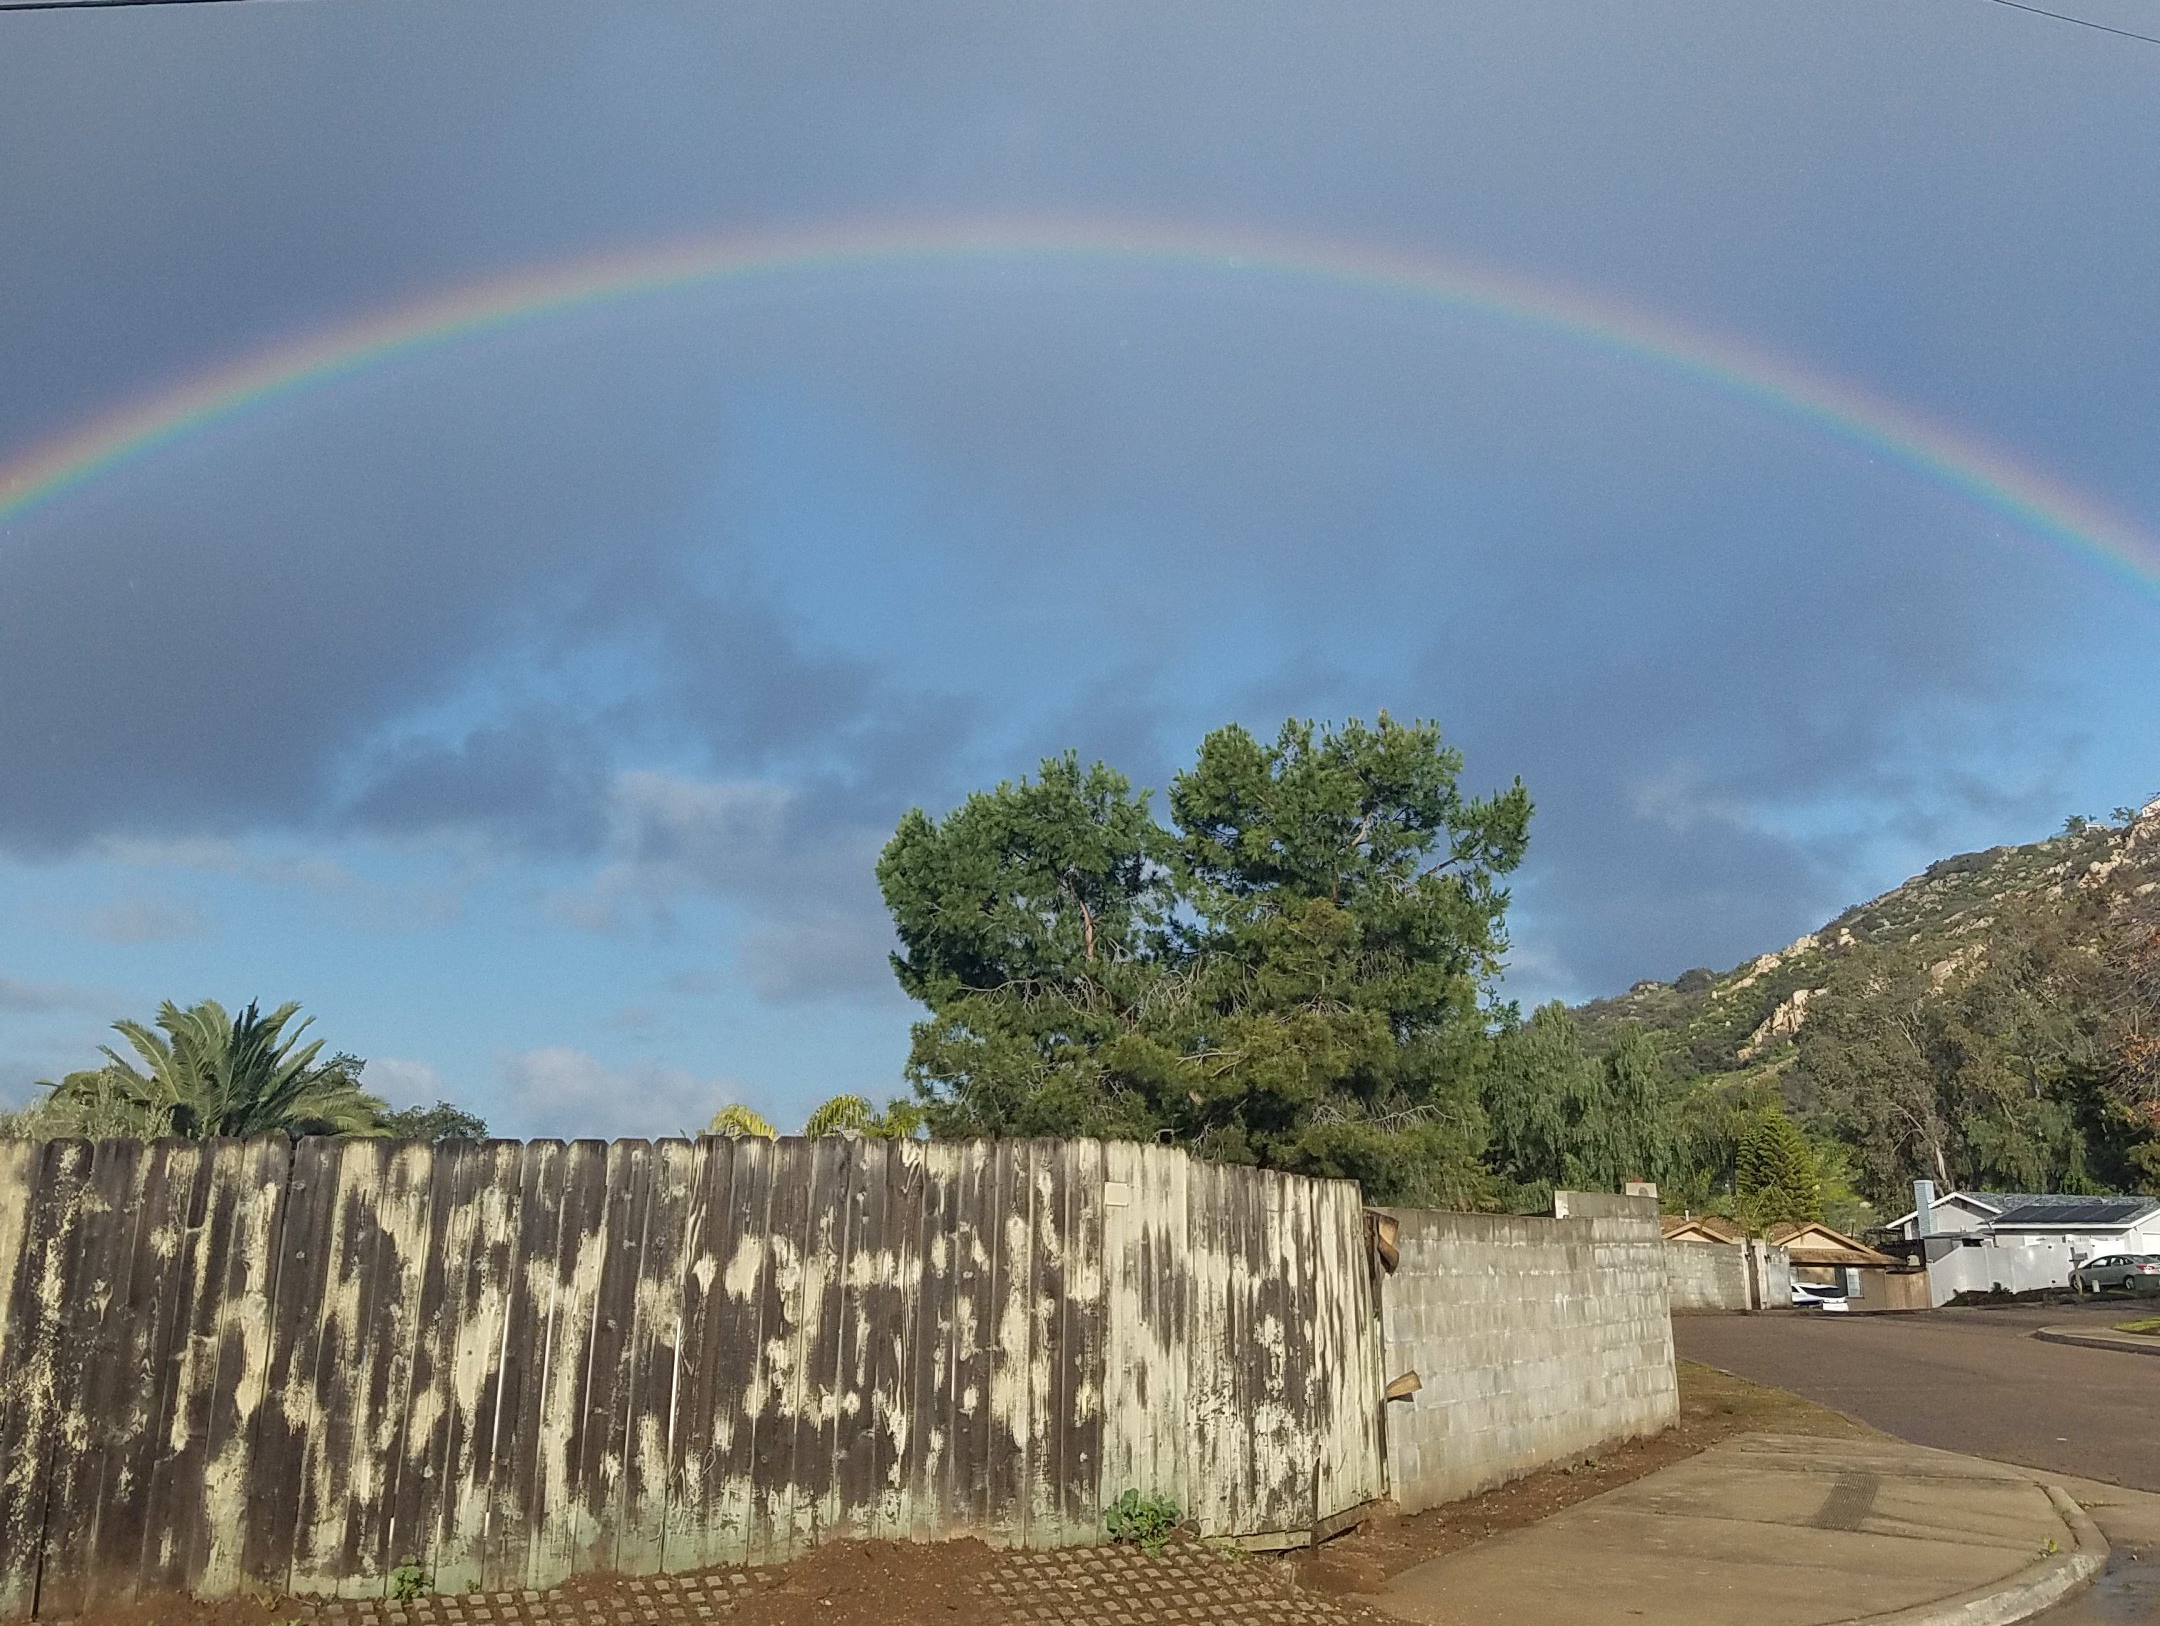 #rainbow, #elcajon, #itsadogslifesandiego